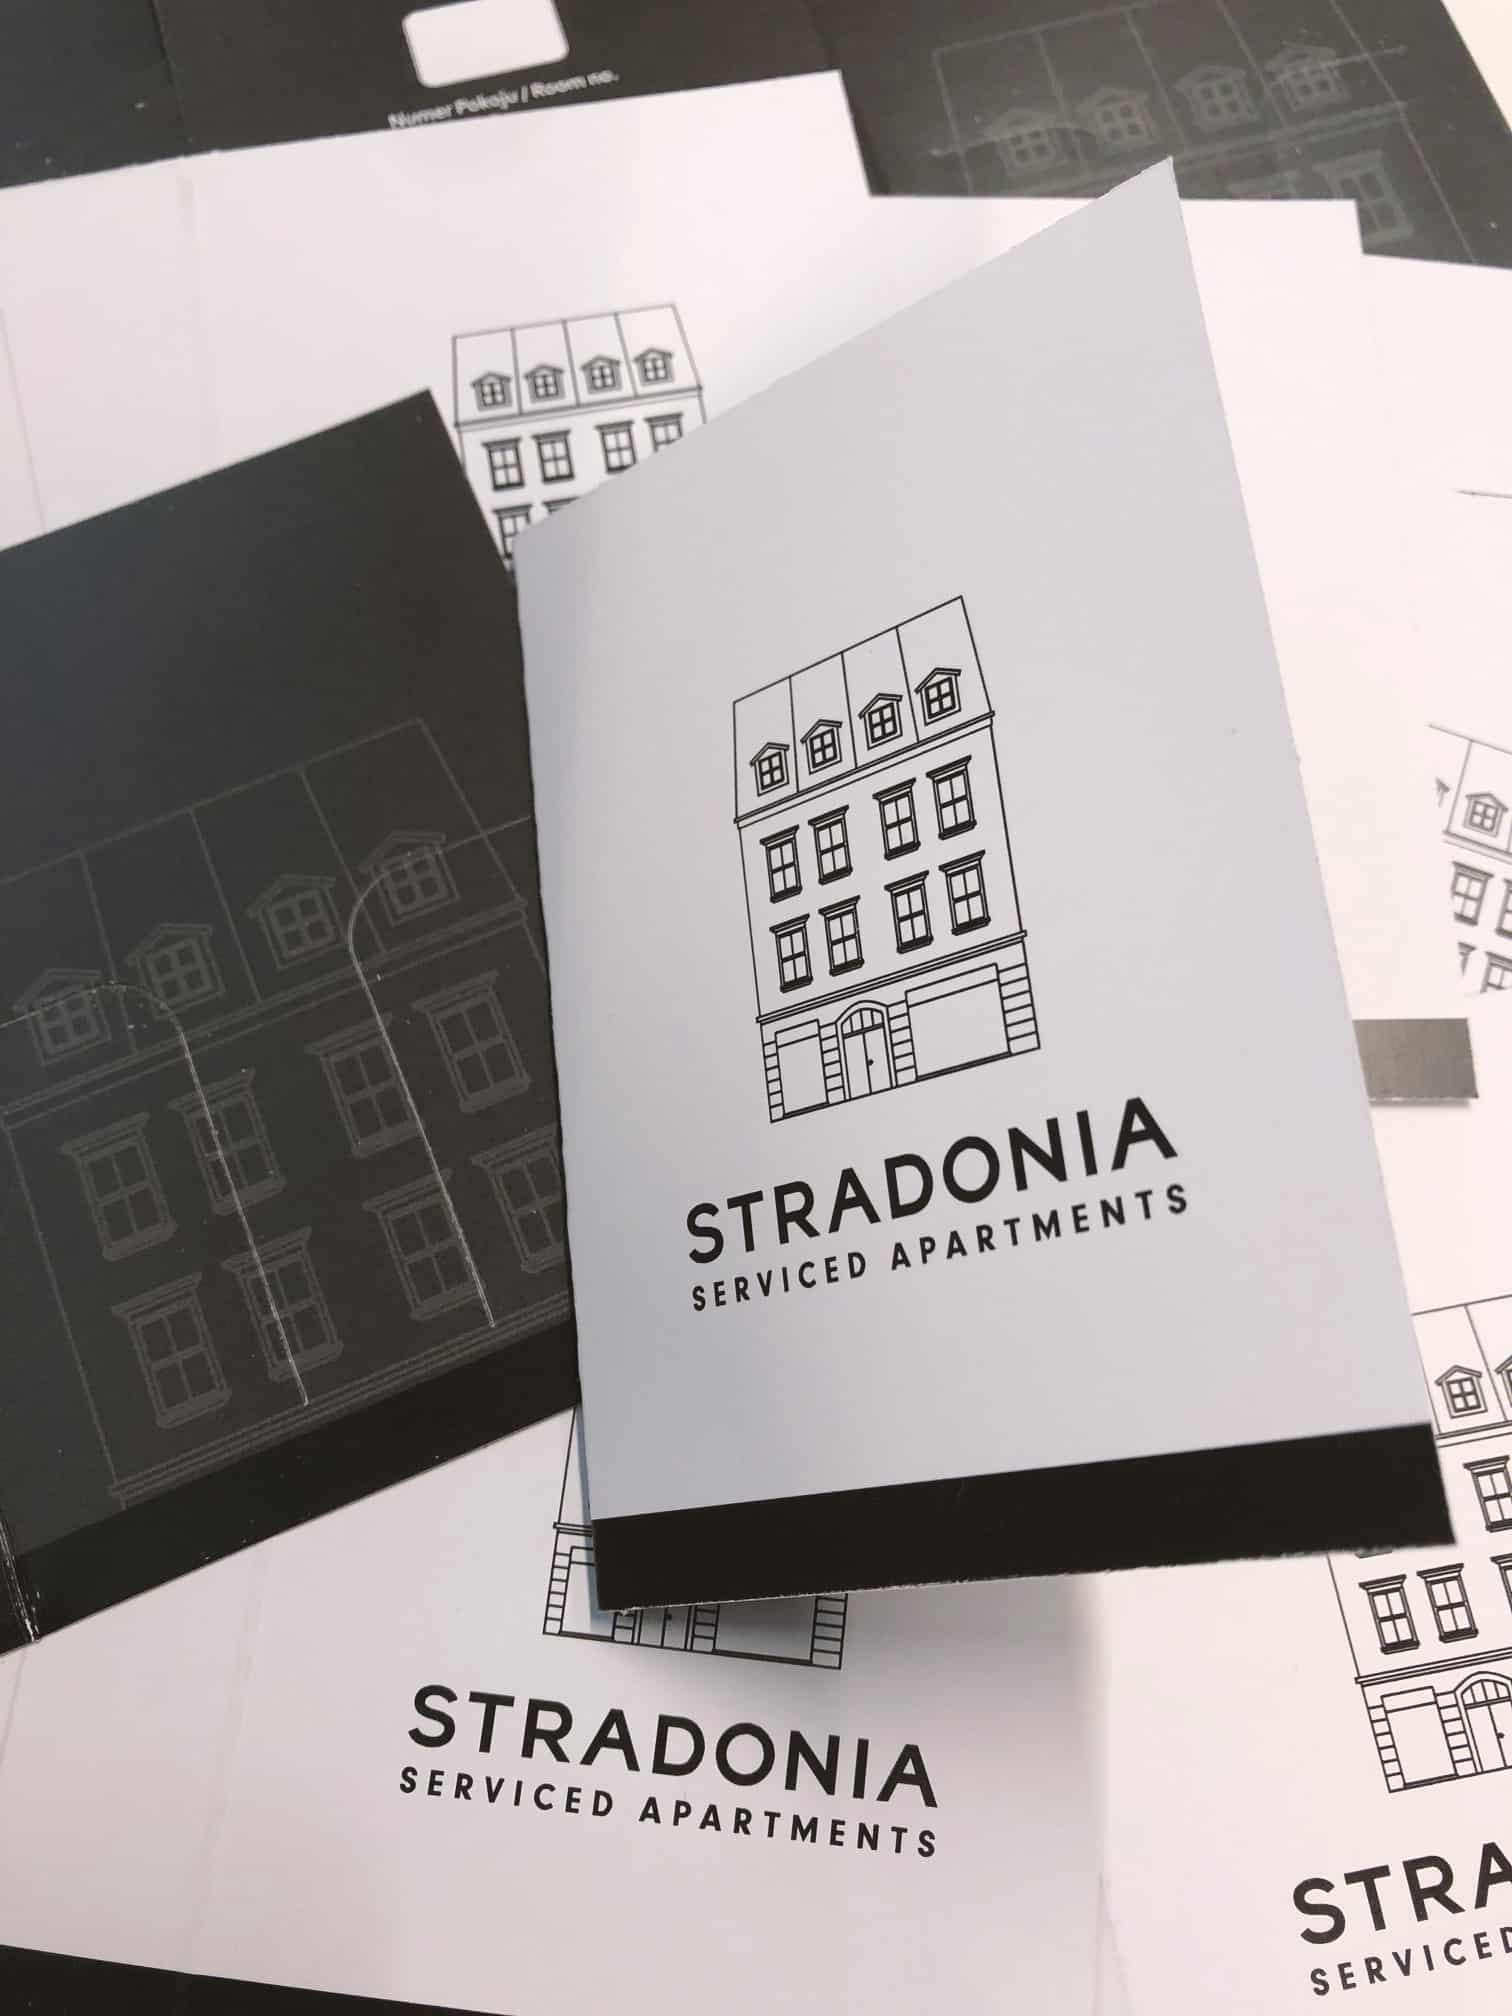 etui na karty hotelowe z nadrukowanym logo Stradonia